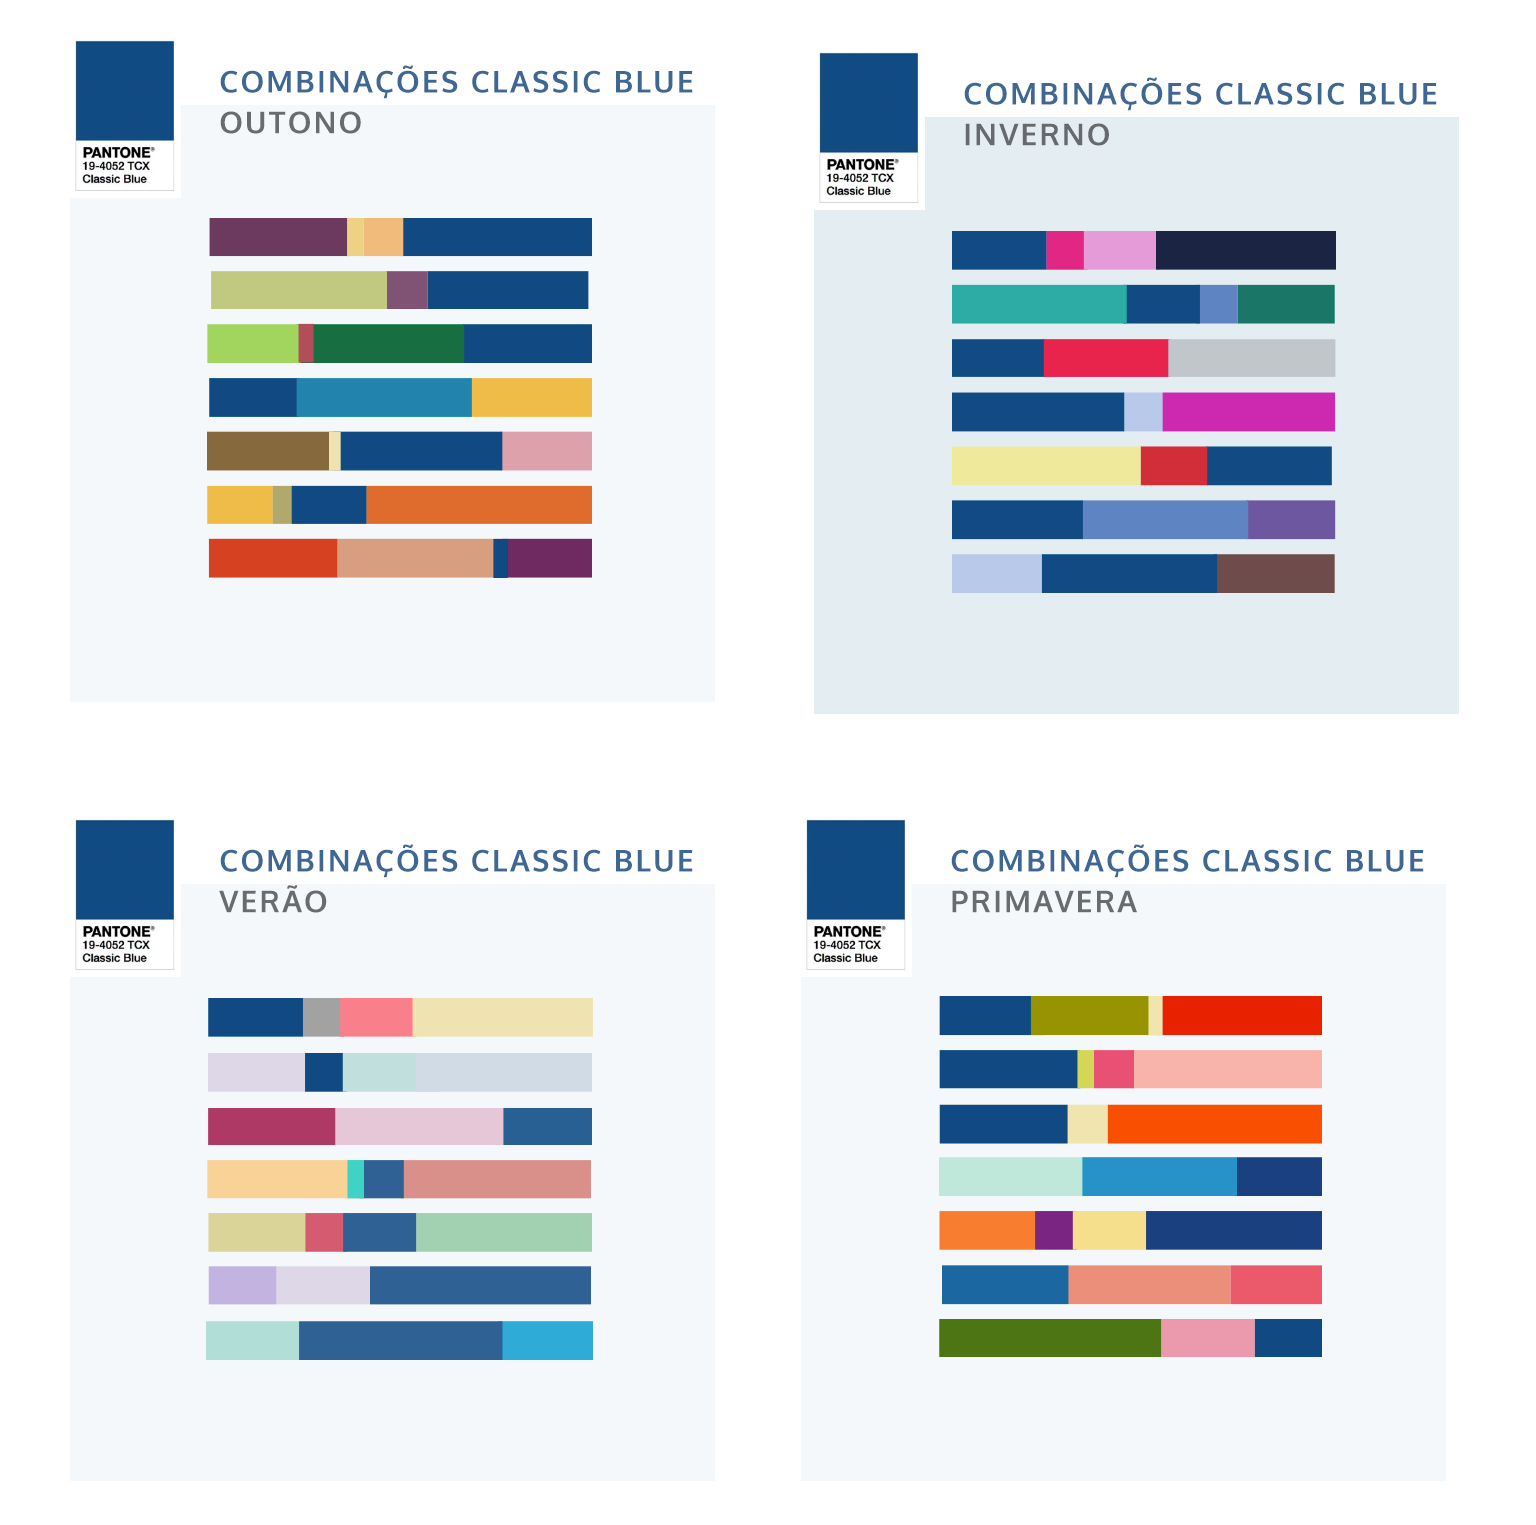 combinacoes-classic-blue